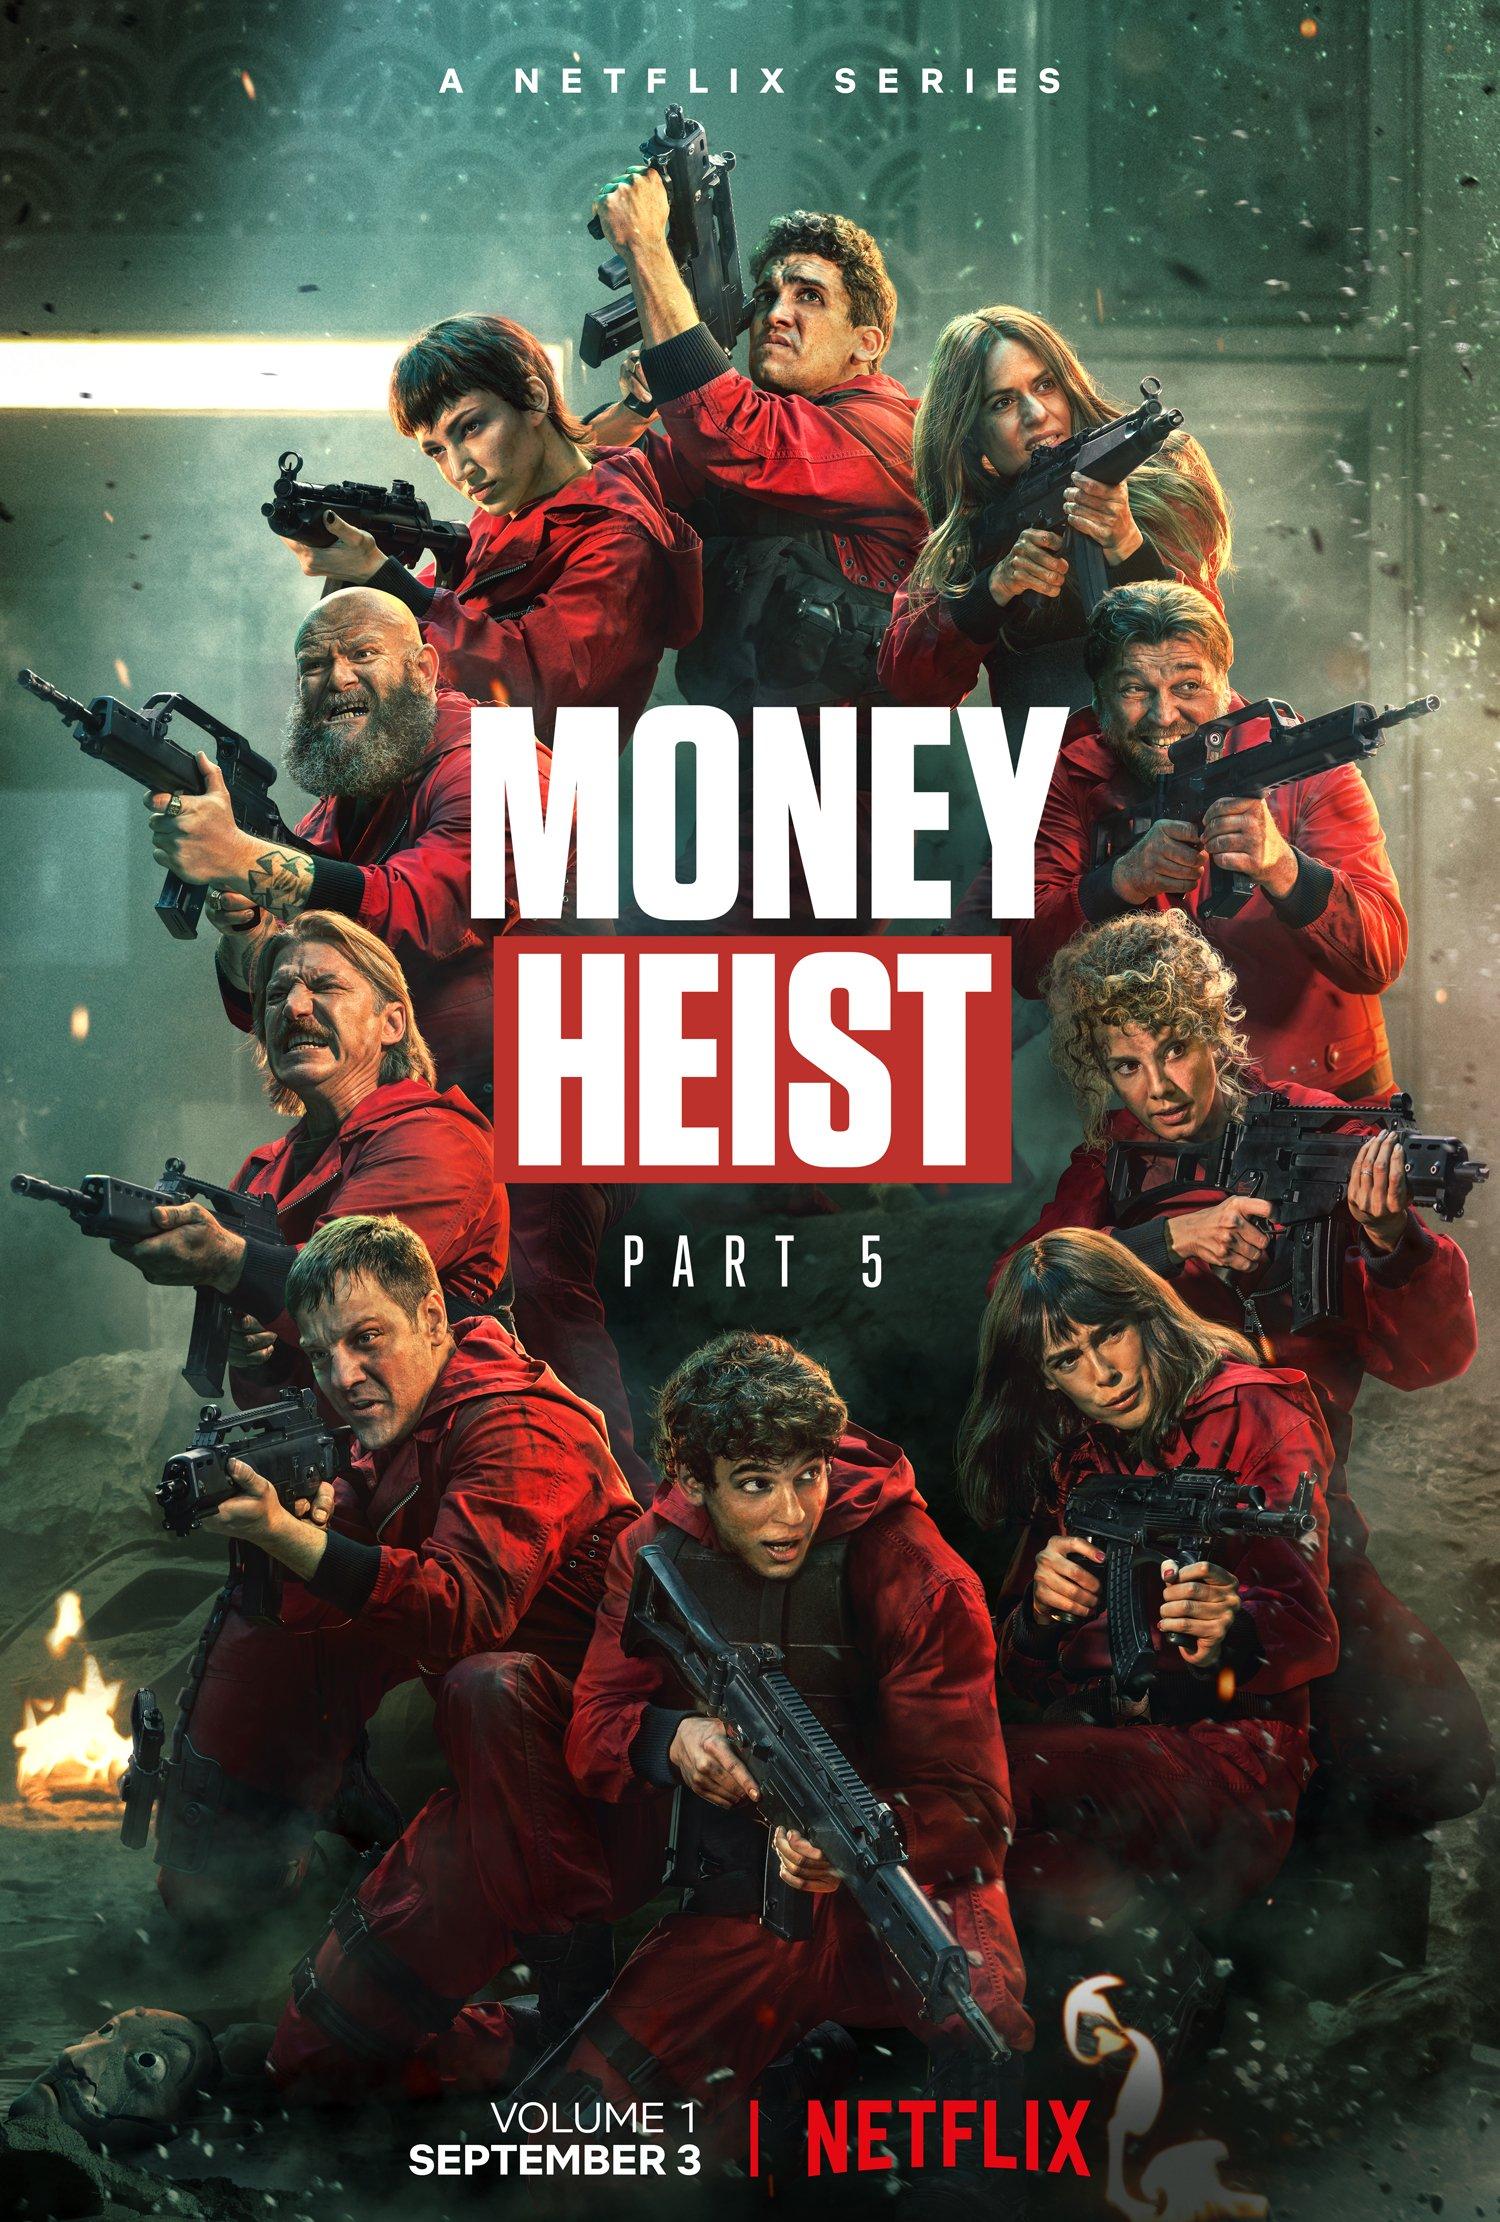 Money Heist 2021 Season 5 (Vol 1) Dual Audio Hindi ORG 720p WEB-DL 1.9GB Download